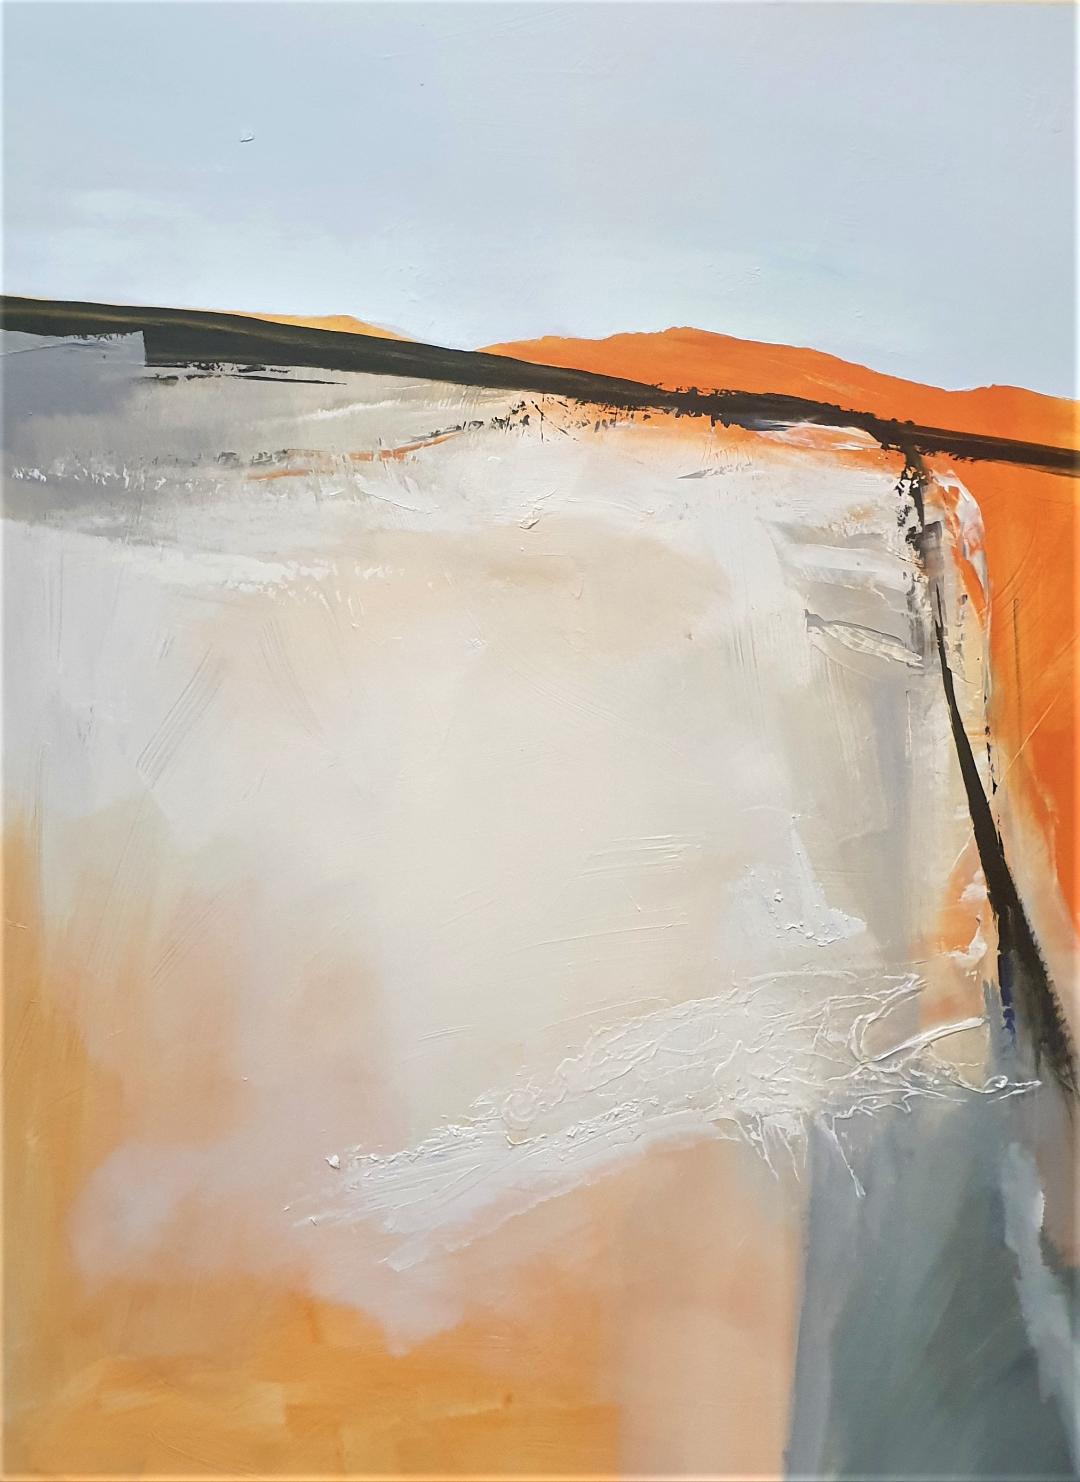 Dune-41.5-x-29.5-ins-acrylic-on-board